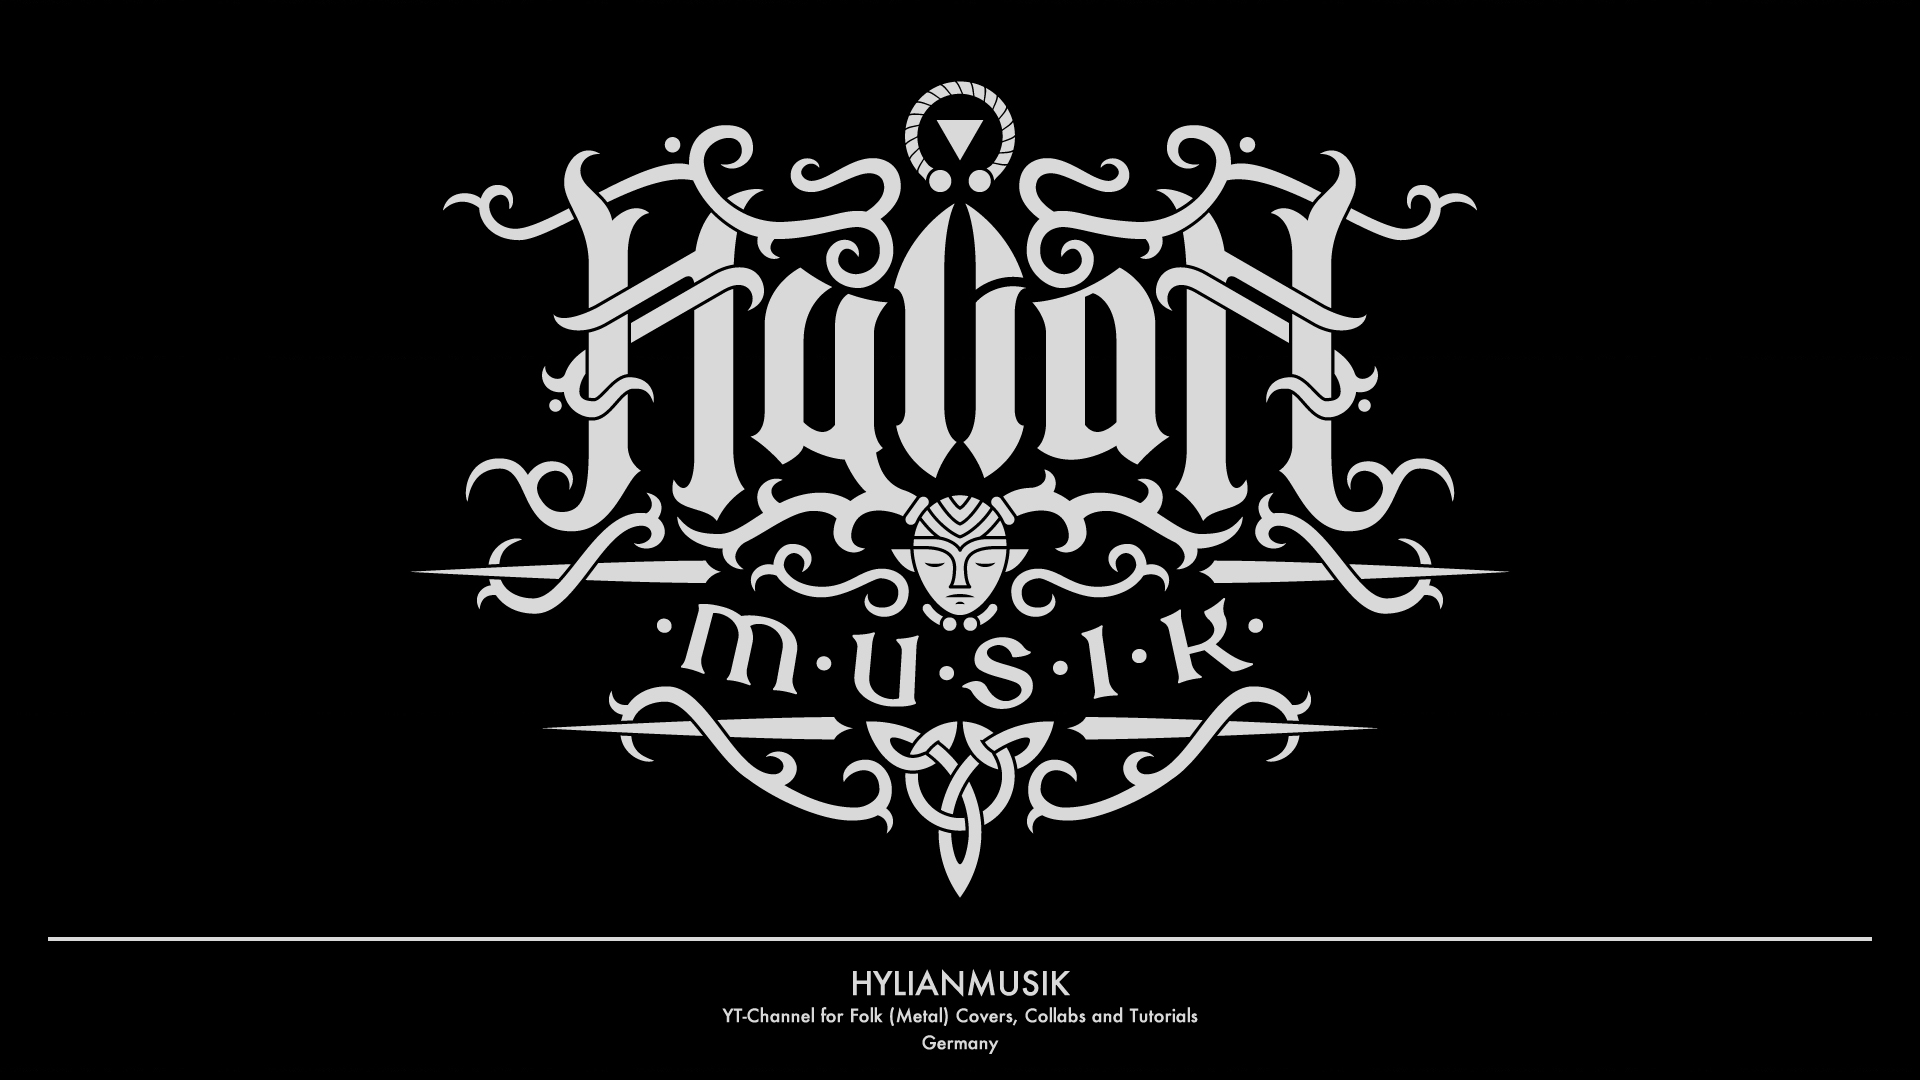 Hylianmusik.jpg